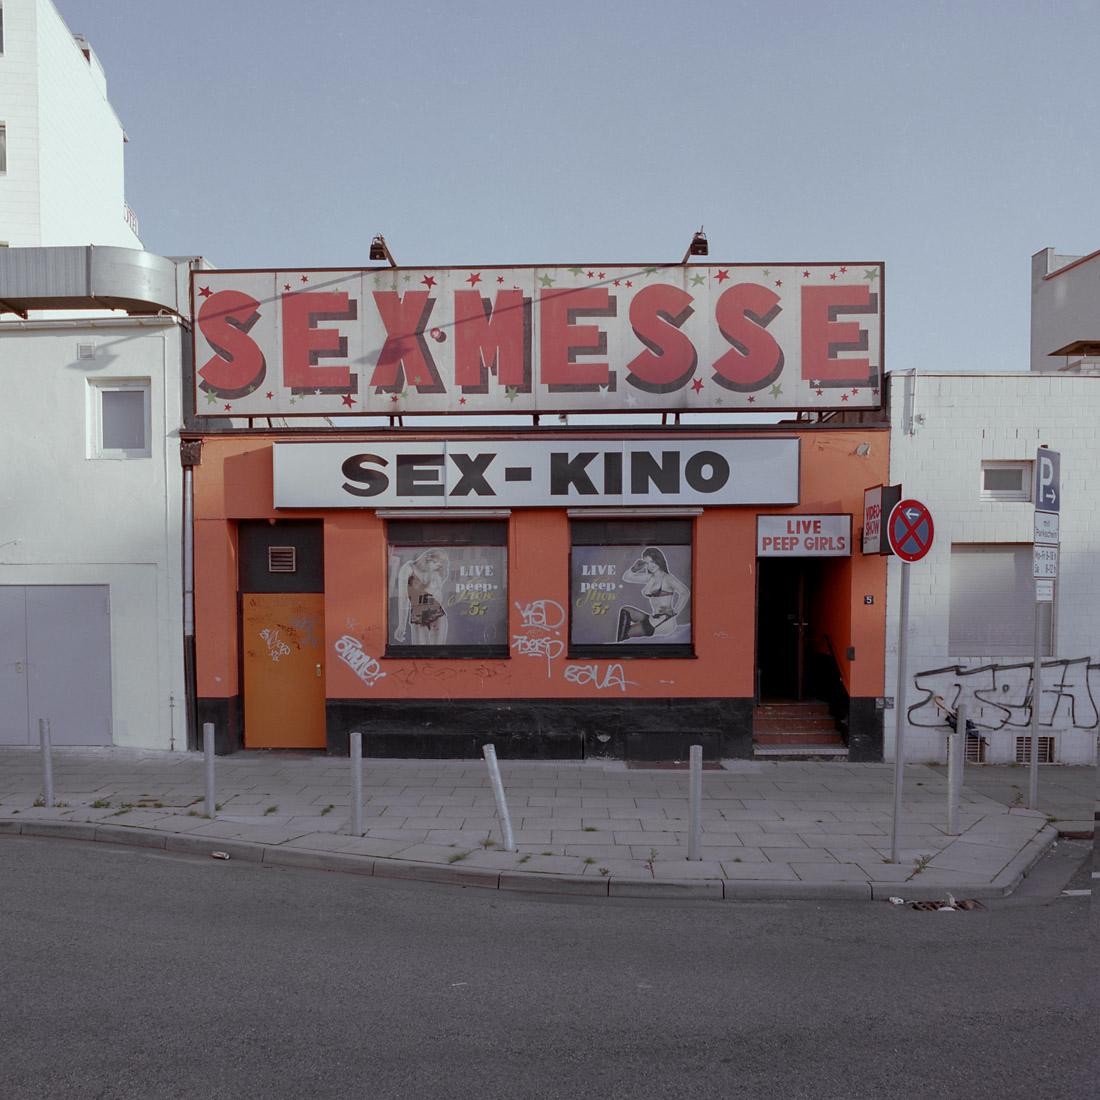 Sexmesse, Seilerstrasse, 1998